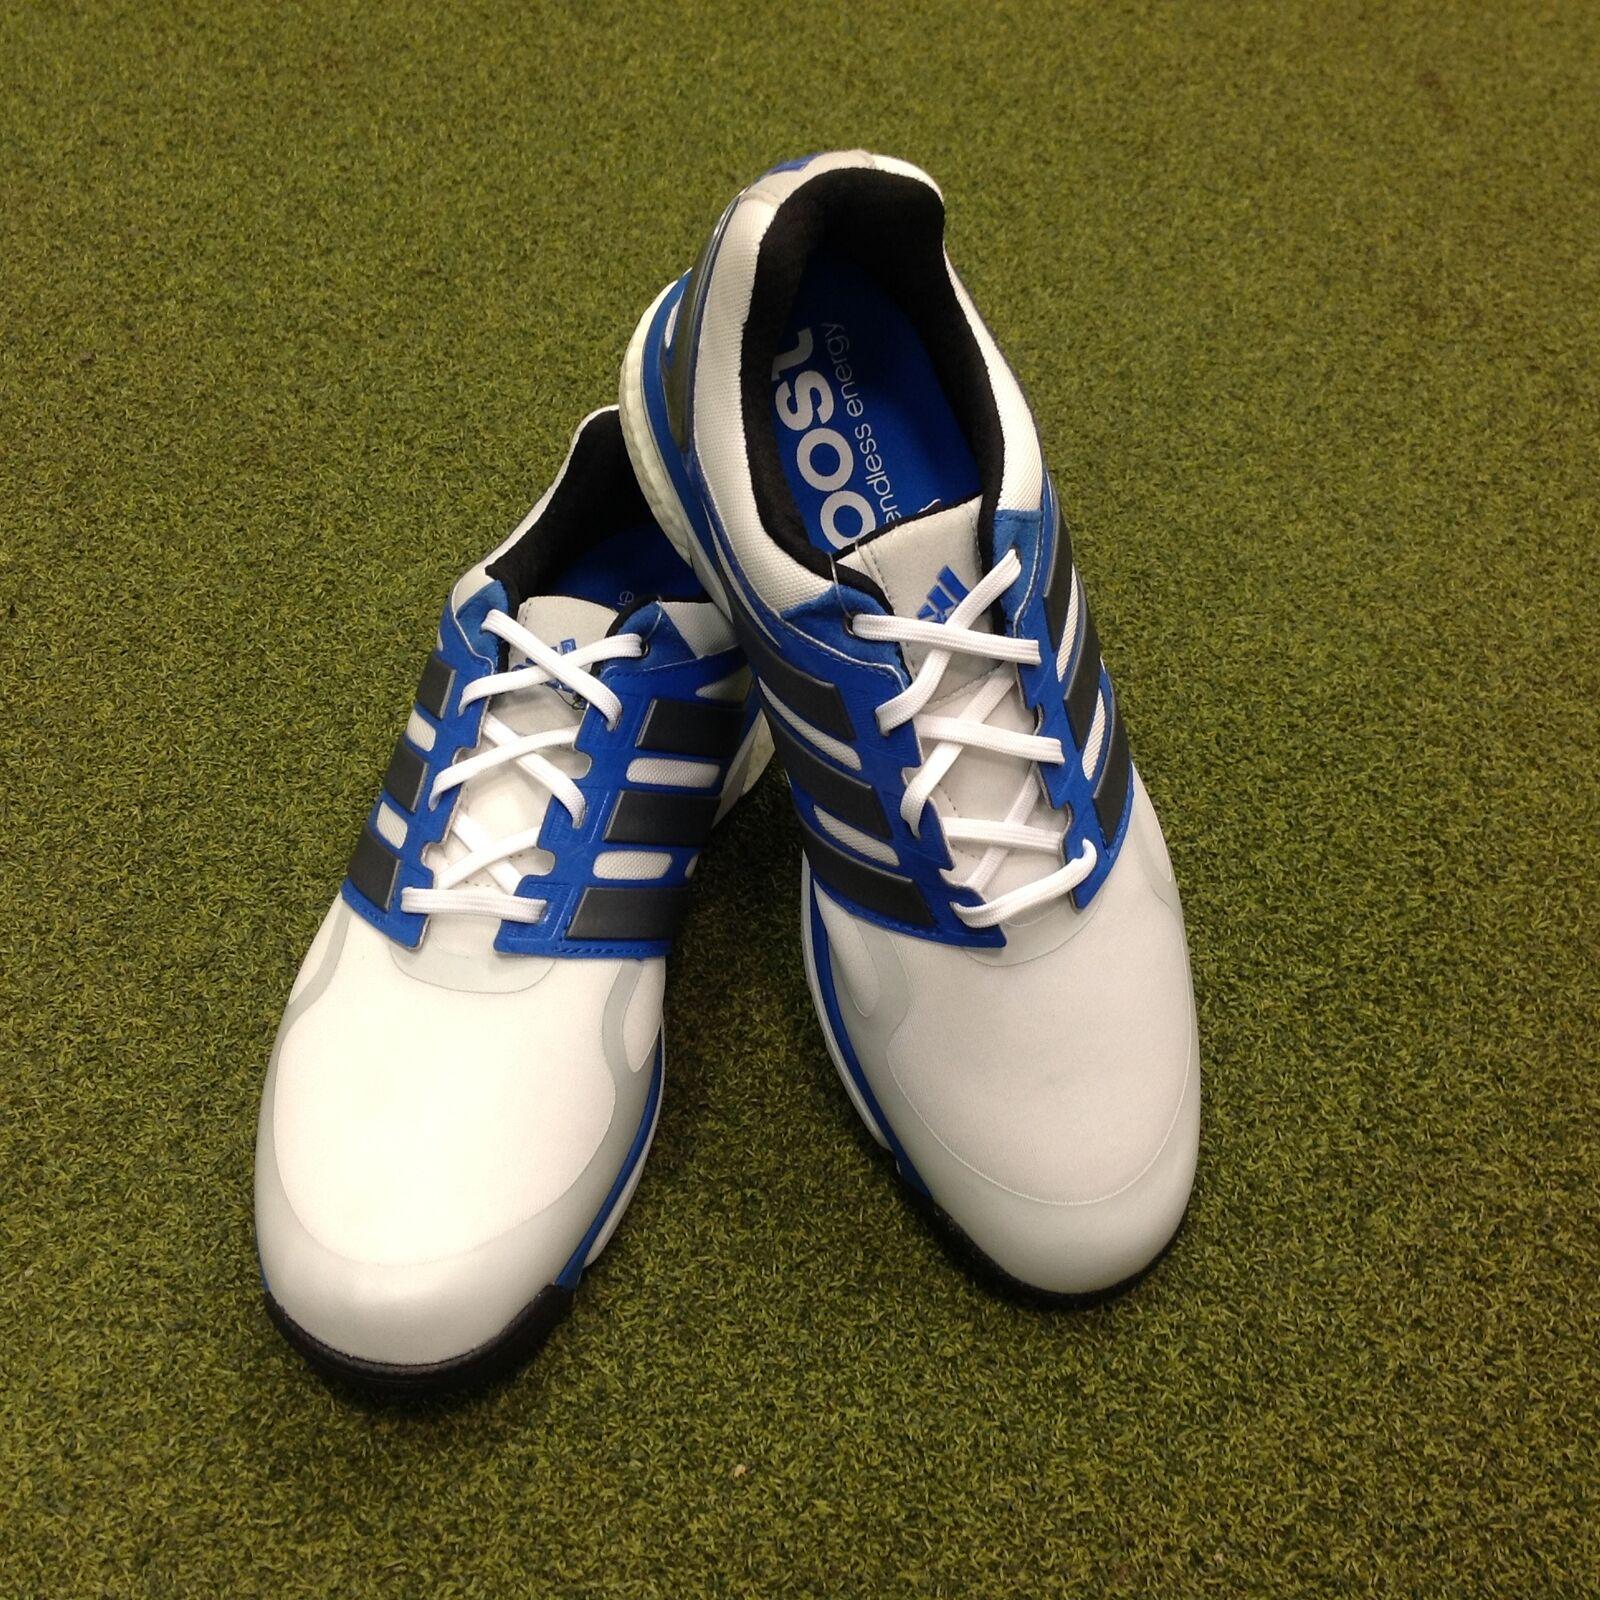 NUOVO Adidas Da Adipower Sport Boost Scarpe Da Adidas Golf-misure US 9-EU 42 2/3 d3794c